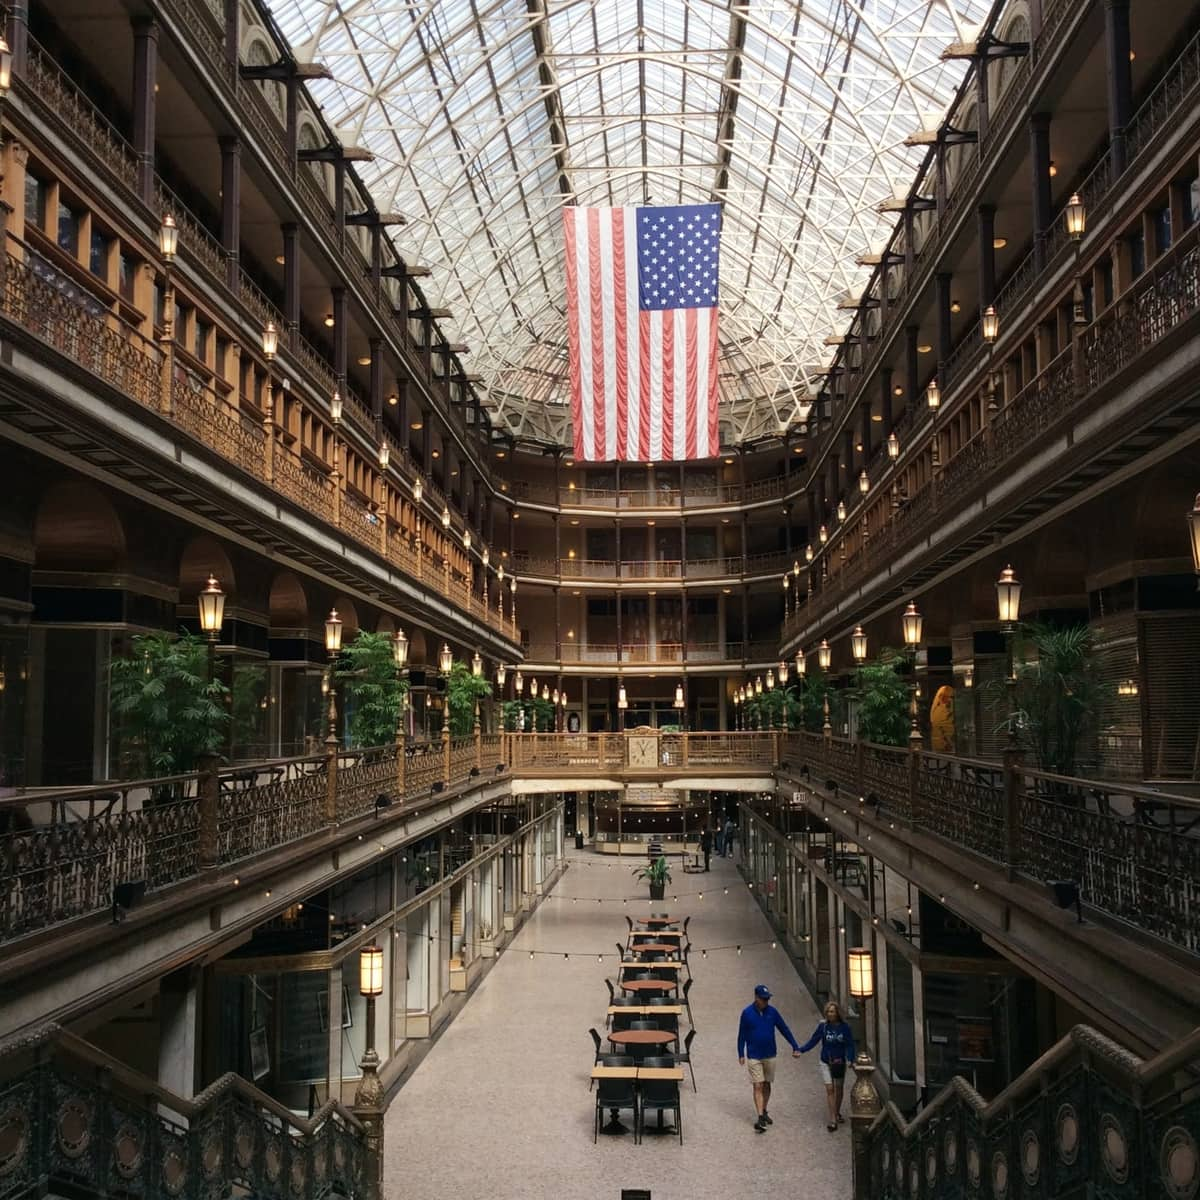 Cleveland Arcarde Victorian architecture